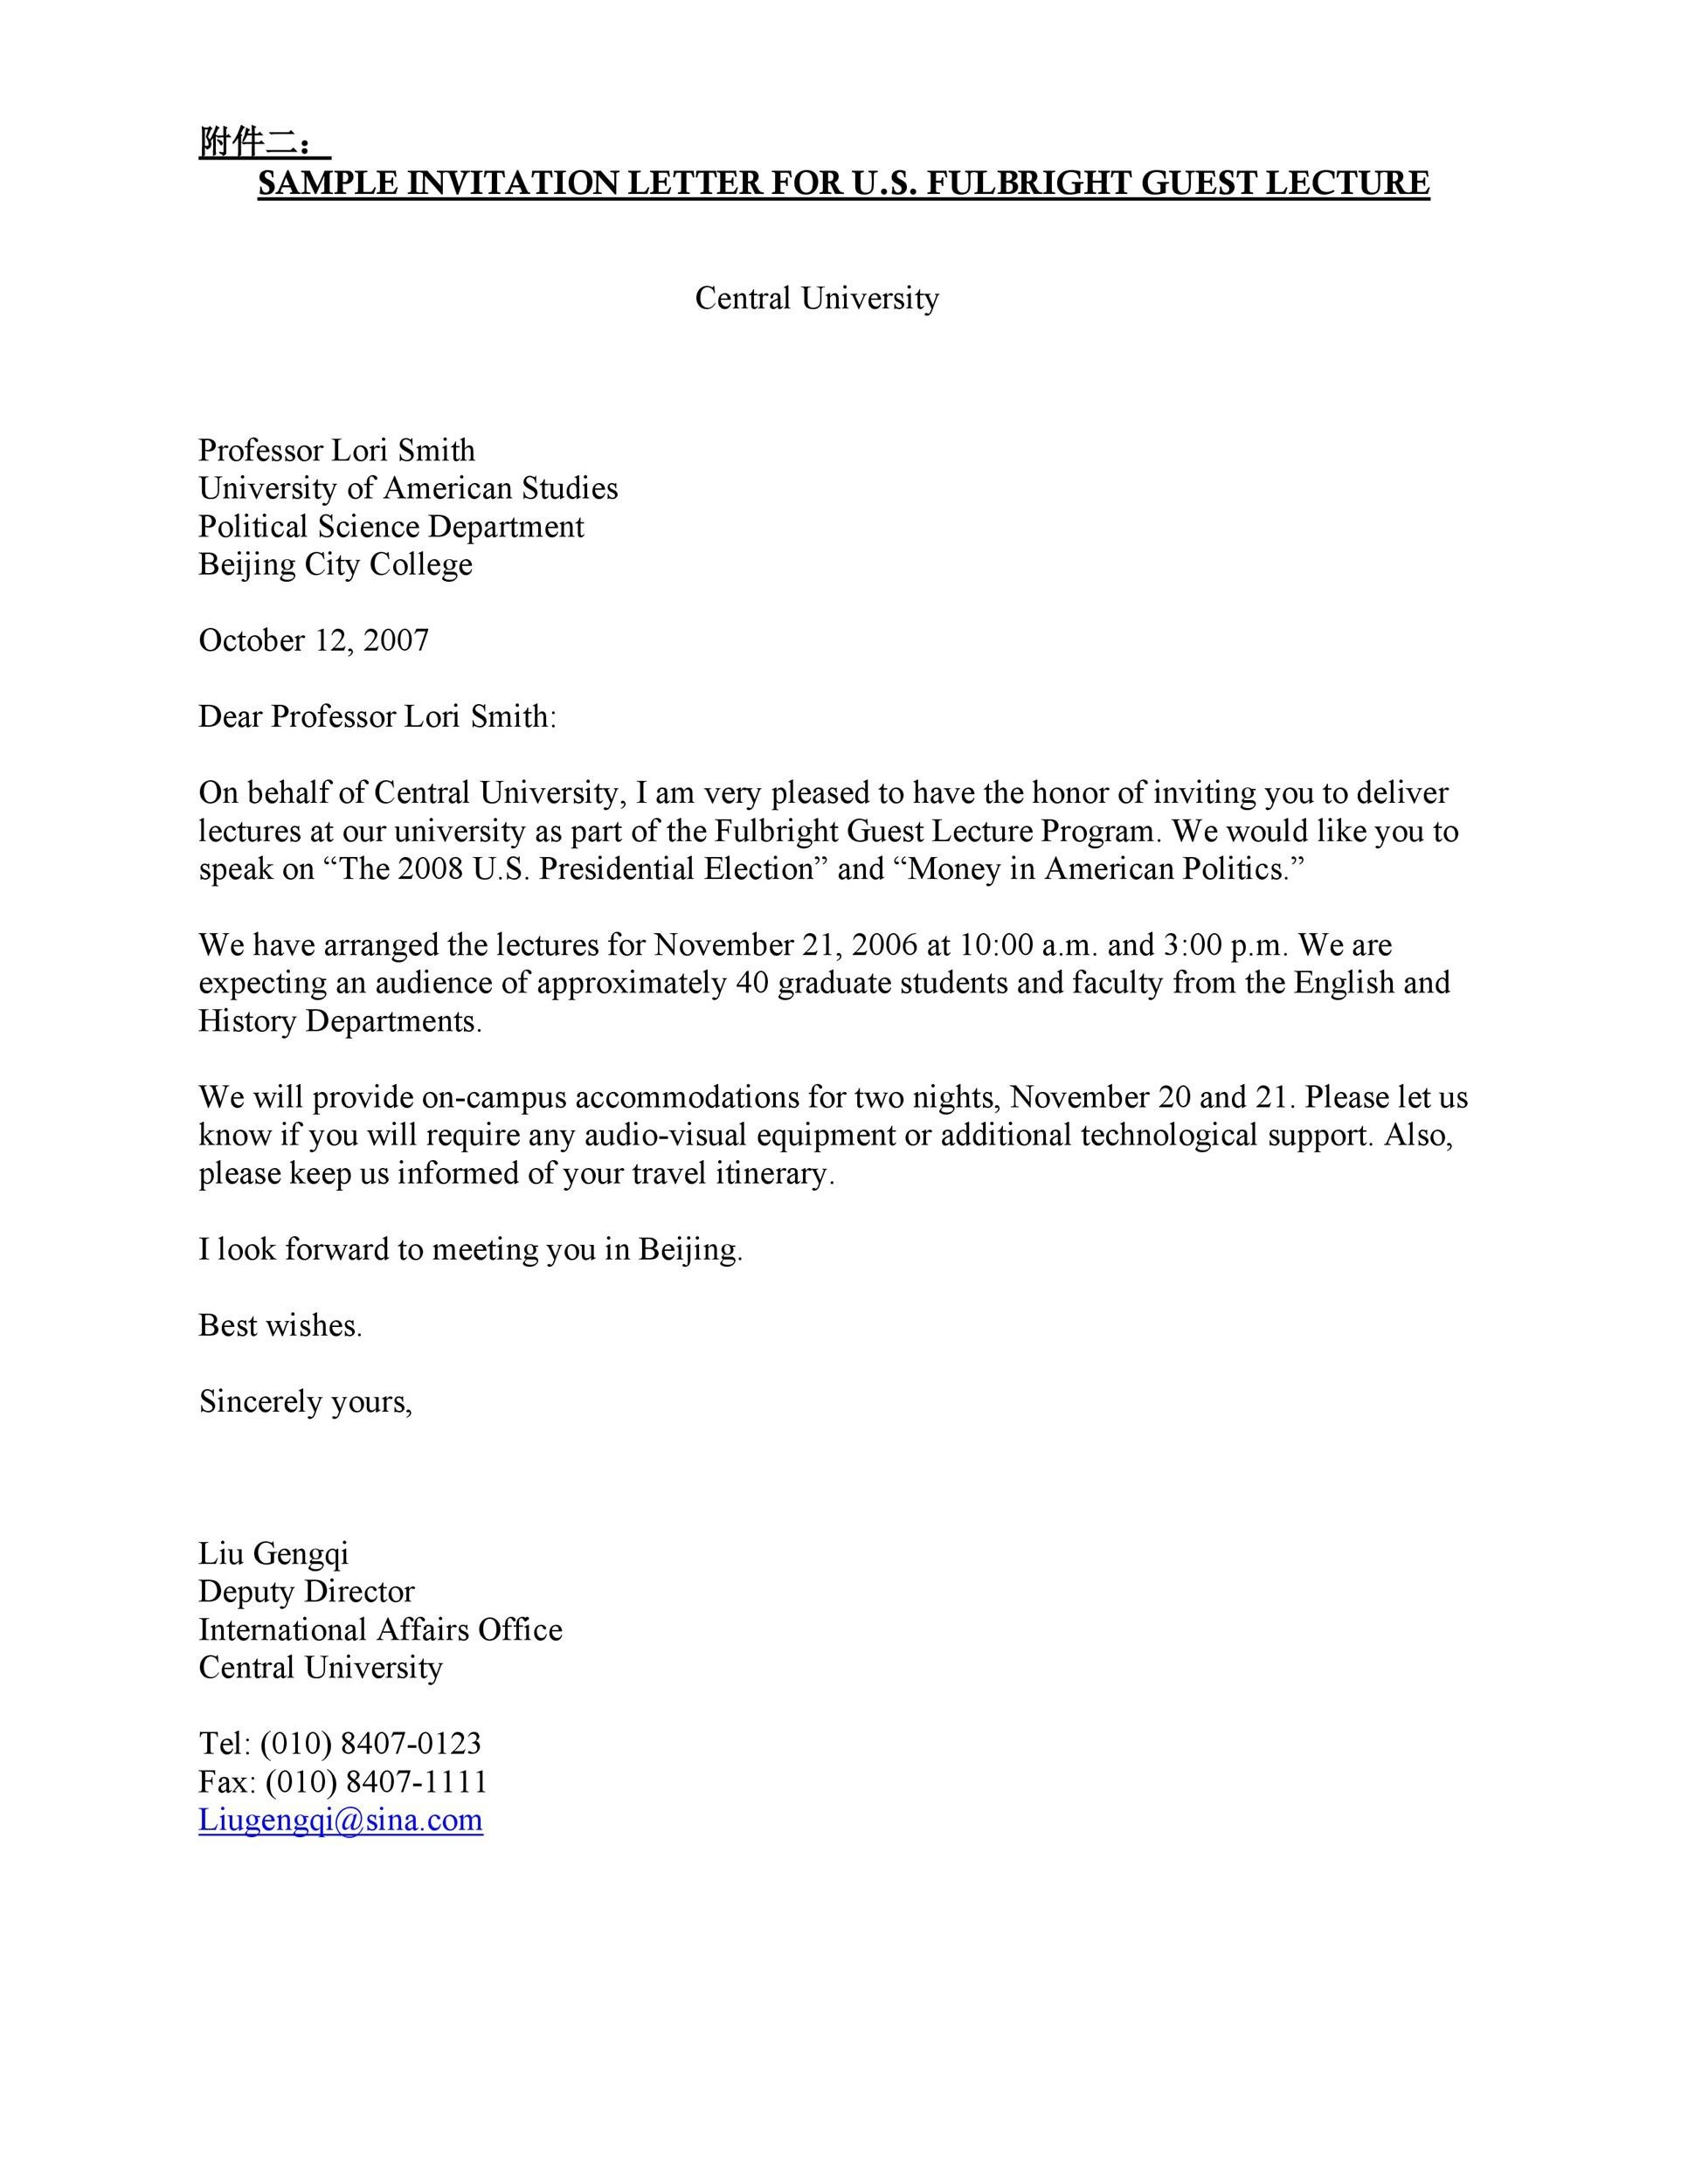 Free invitation letter 18